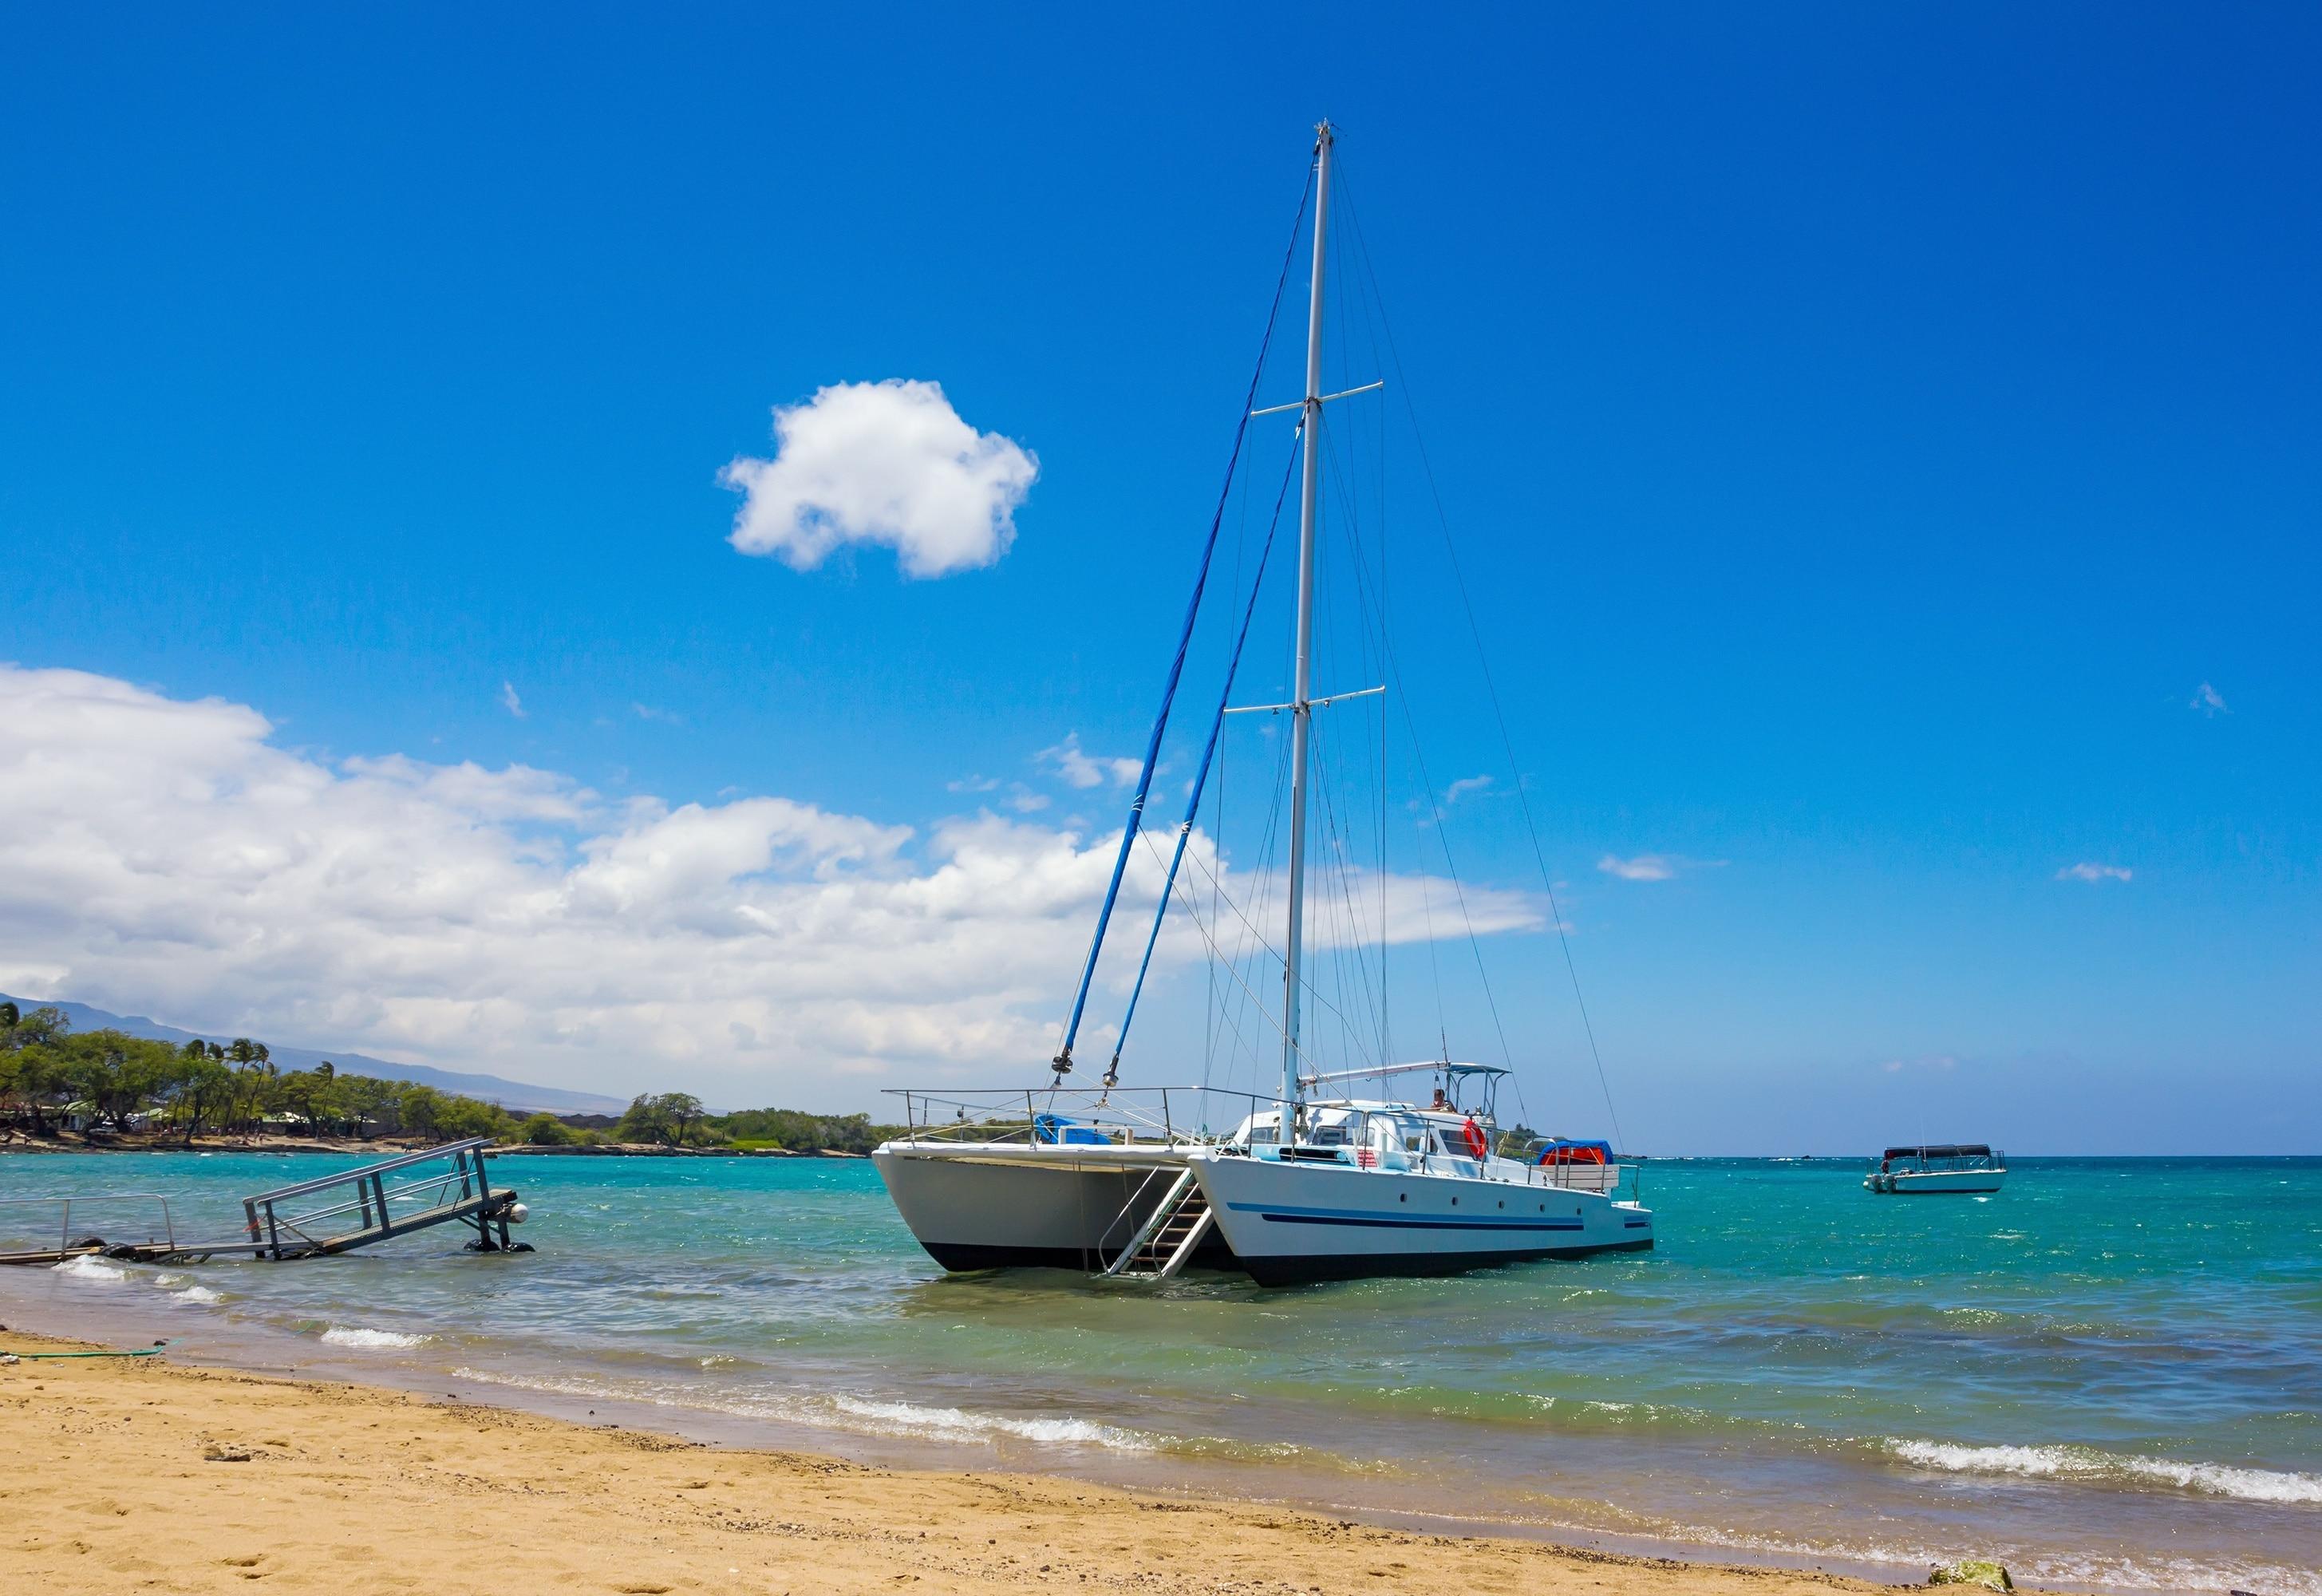 Kolea, Waikoloa, Hawaii, United States of America